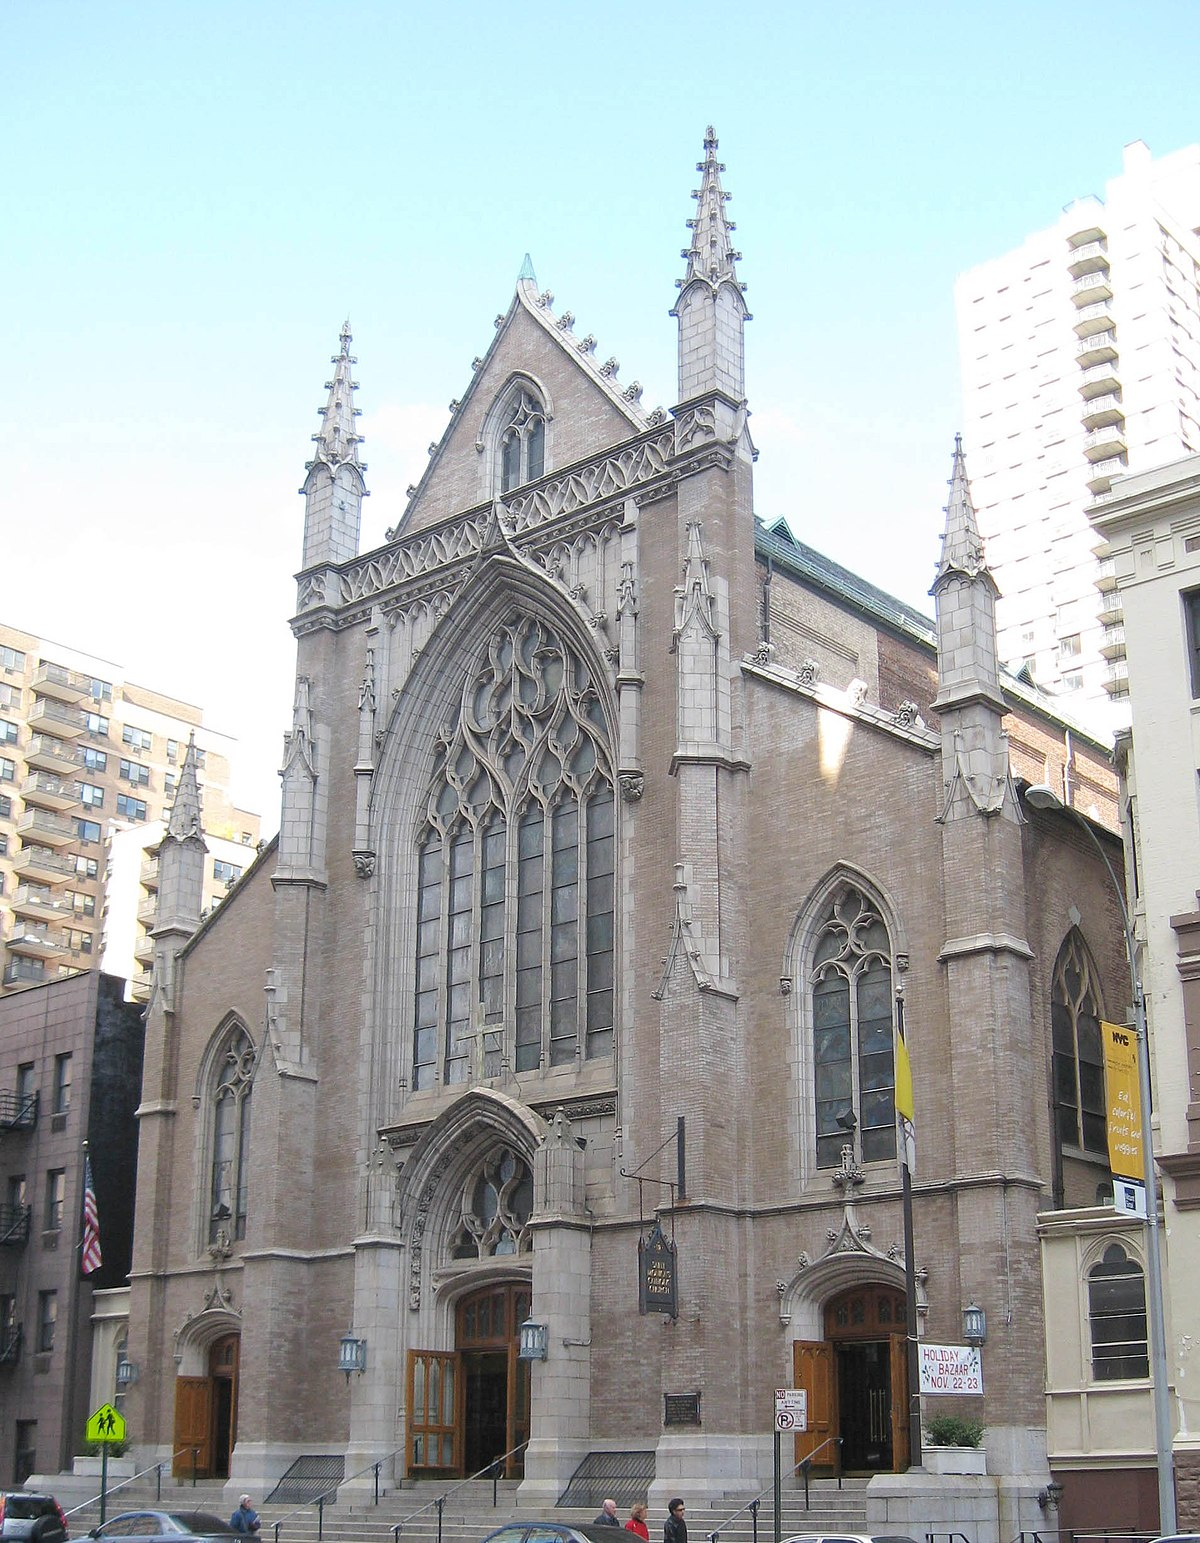 St. Monica Catholic Church (Santa Monica, California)